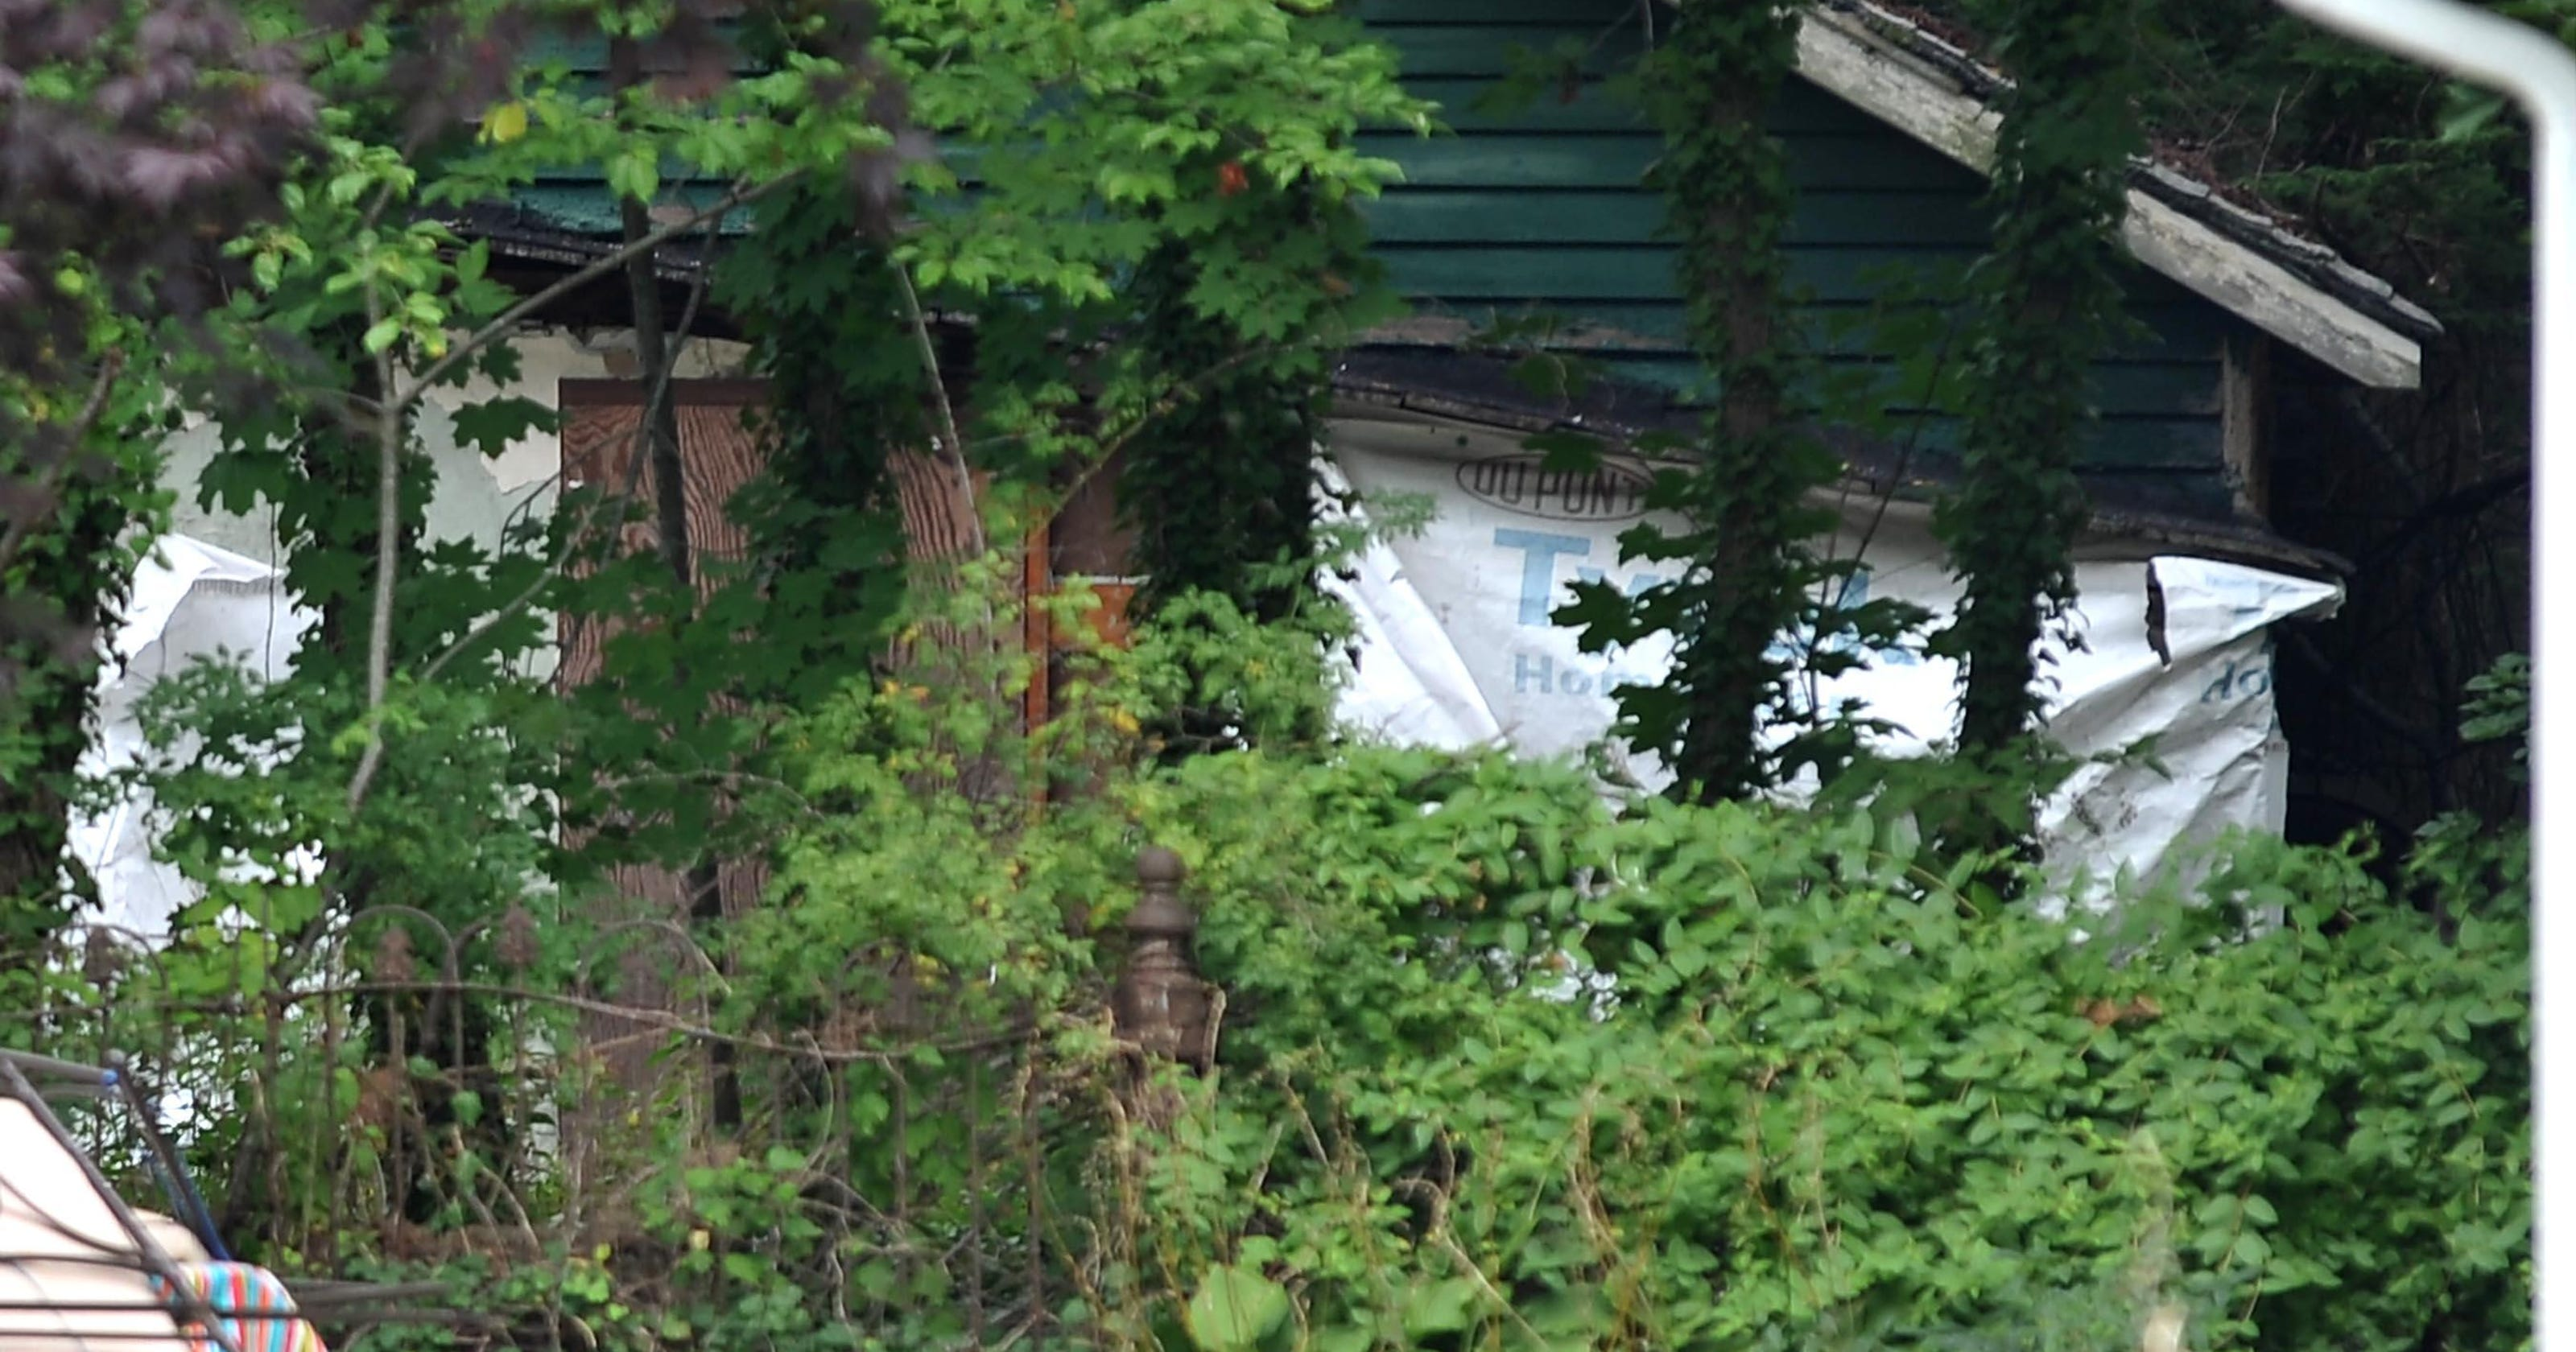 Garden State Cleaners Vineland Nj Garden Ftempo